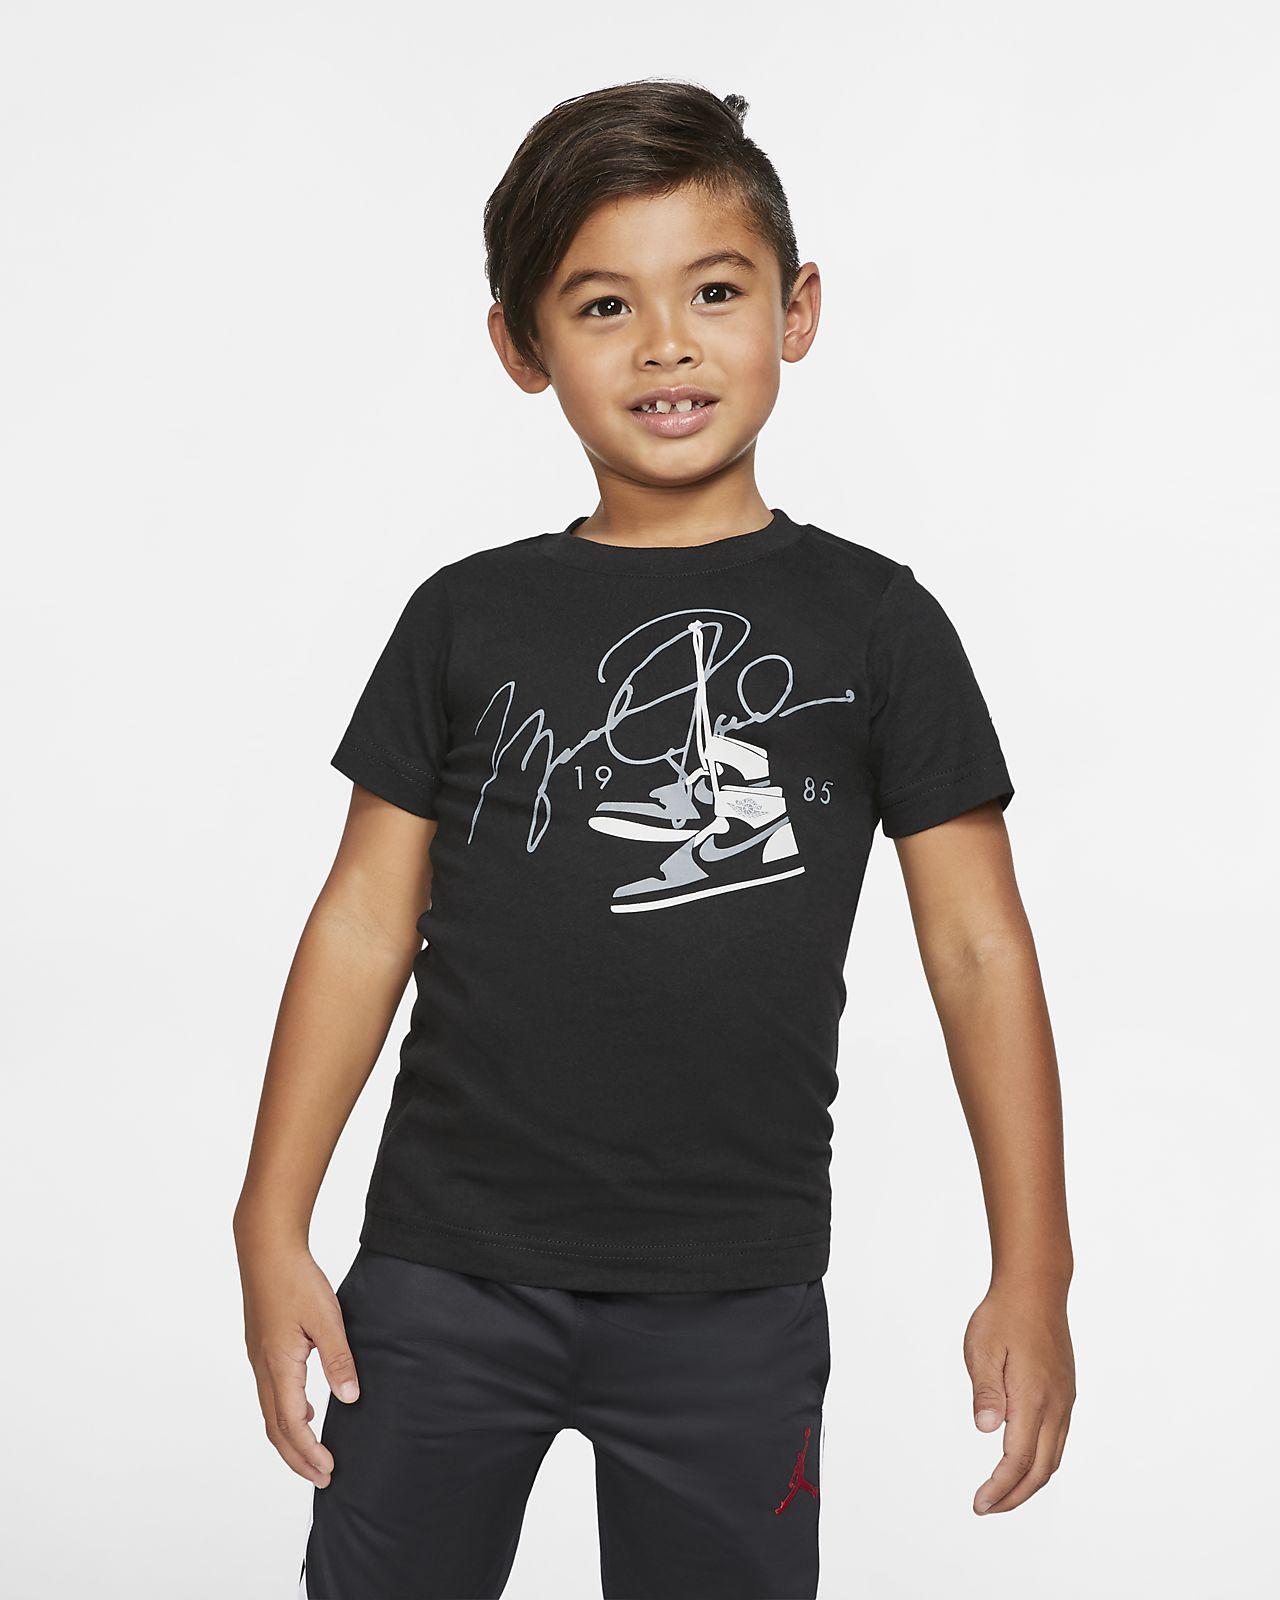 Jordan T-Shirt für jüngere Kinder